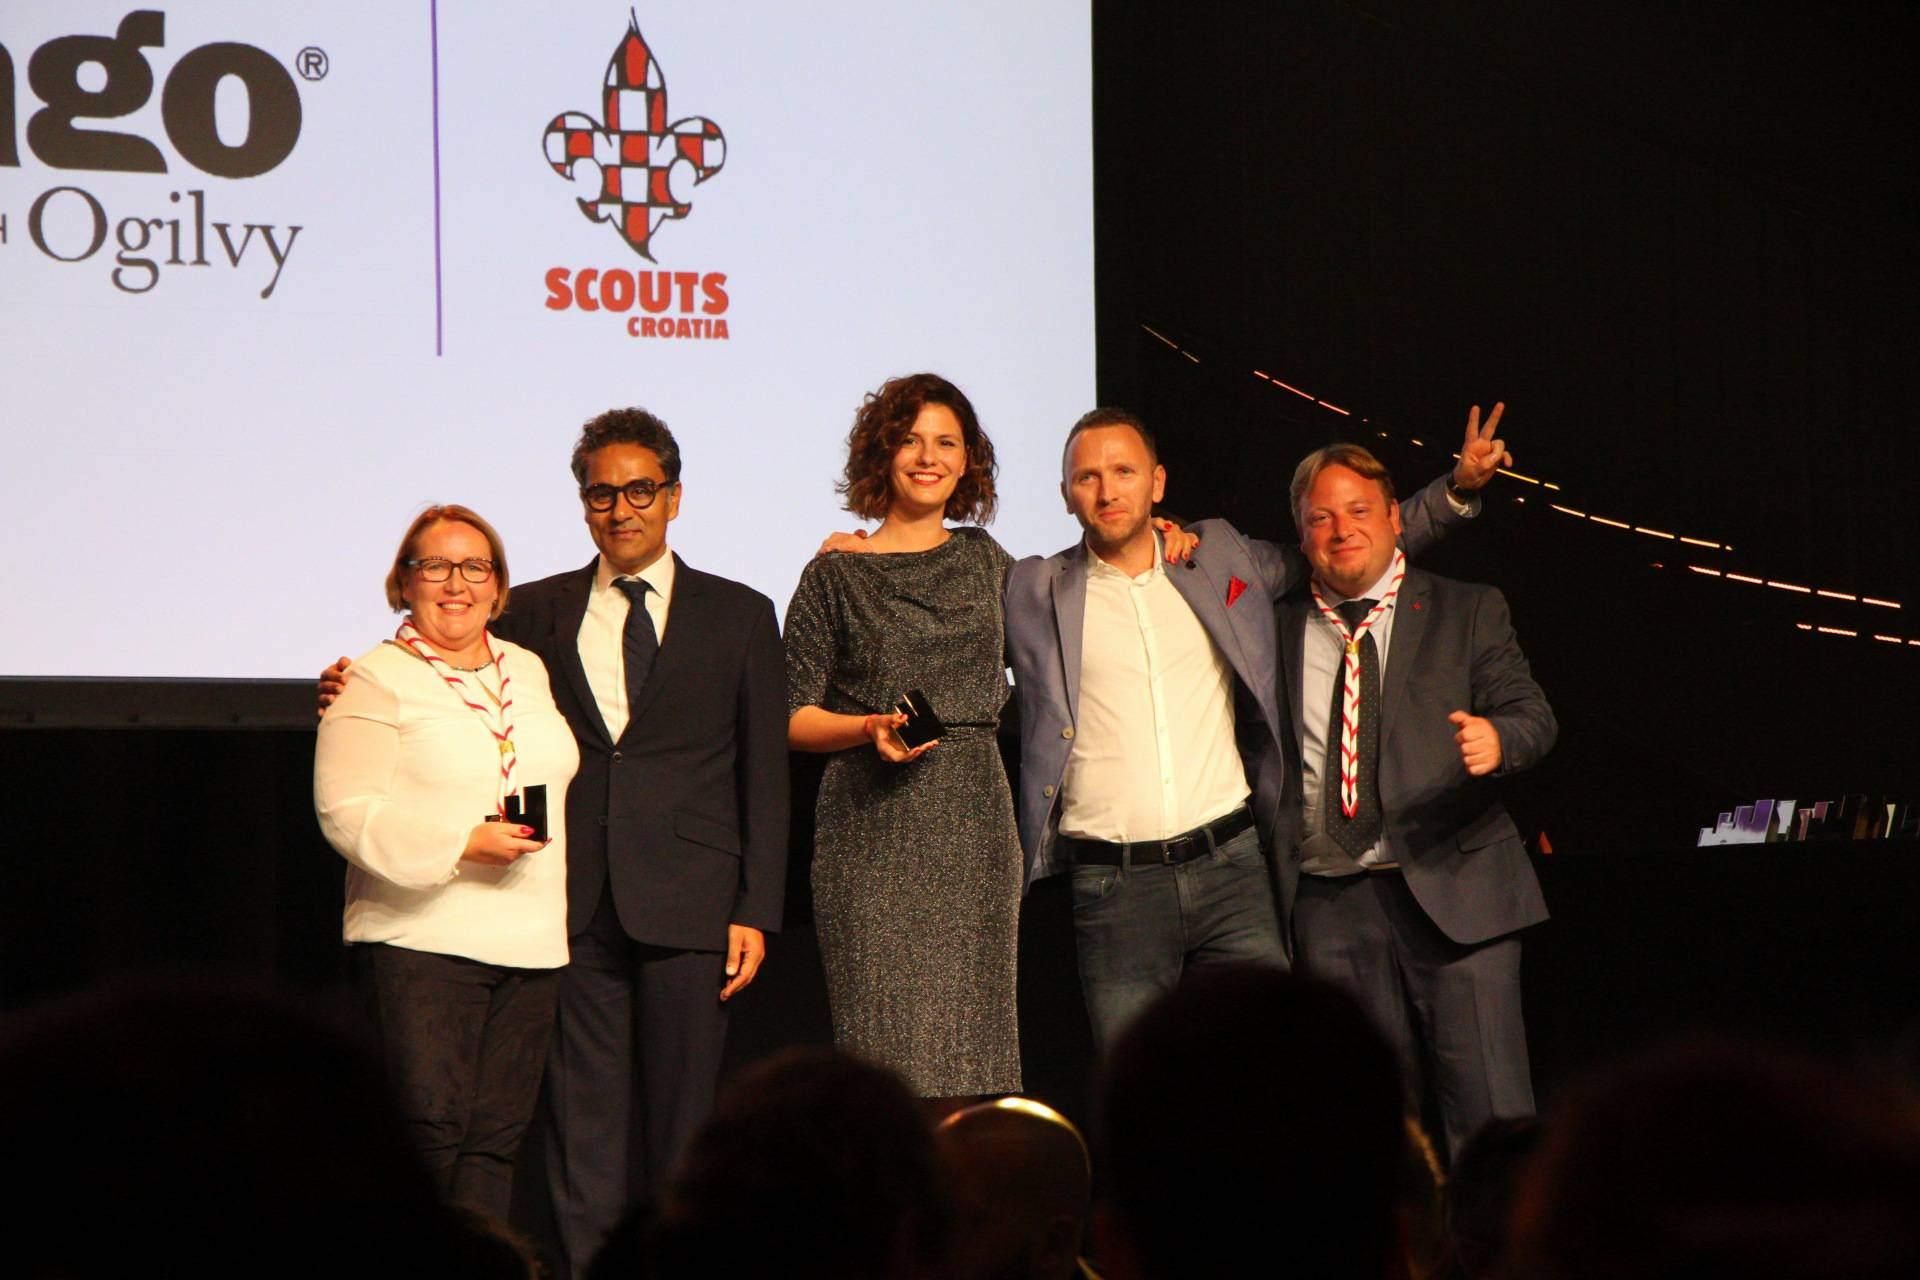 Domaći kreativci nižu nagrade: Image Ogilvy osvojili Euro Effie